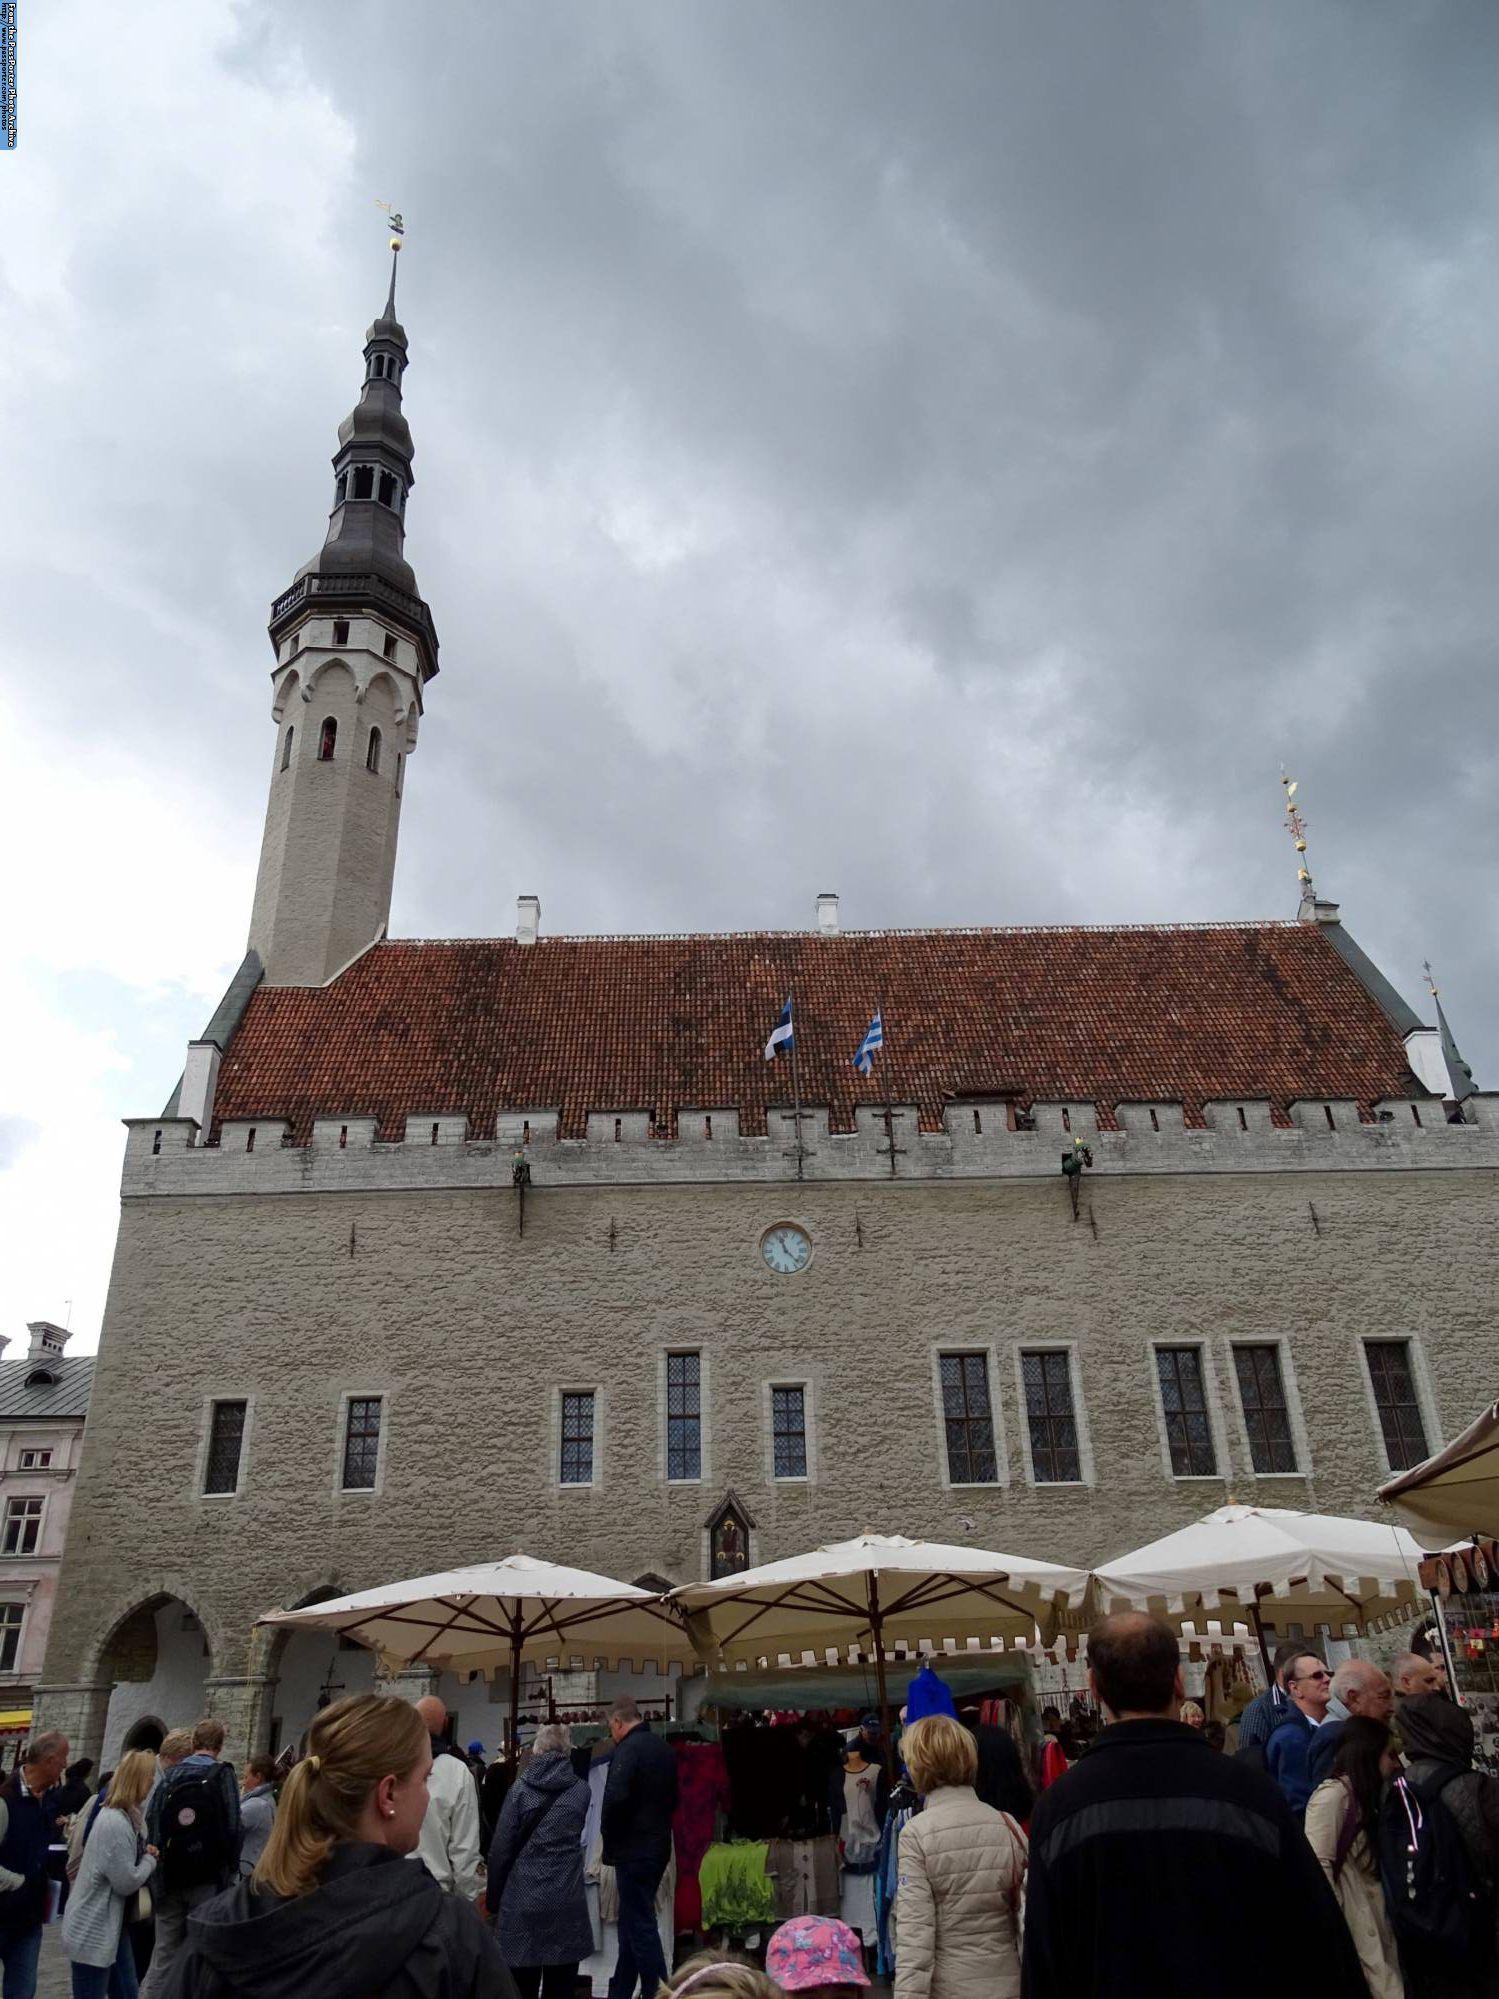 Explore the city of Tallinn, Estonia on your Disney Cruise | PassPorter.com